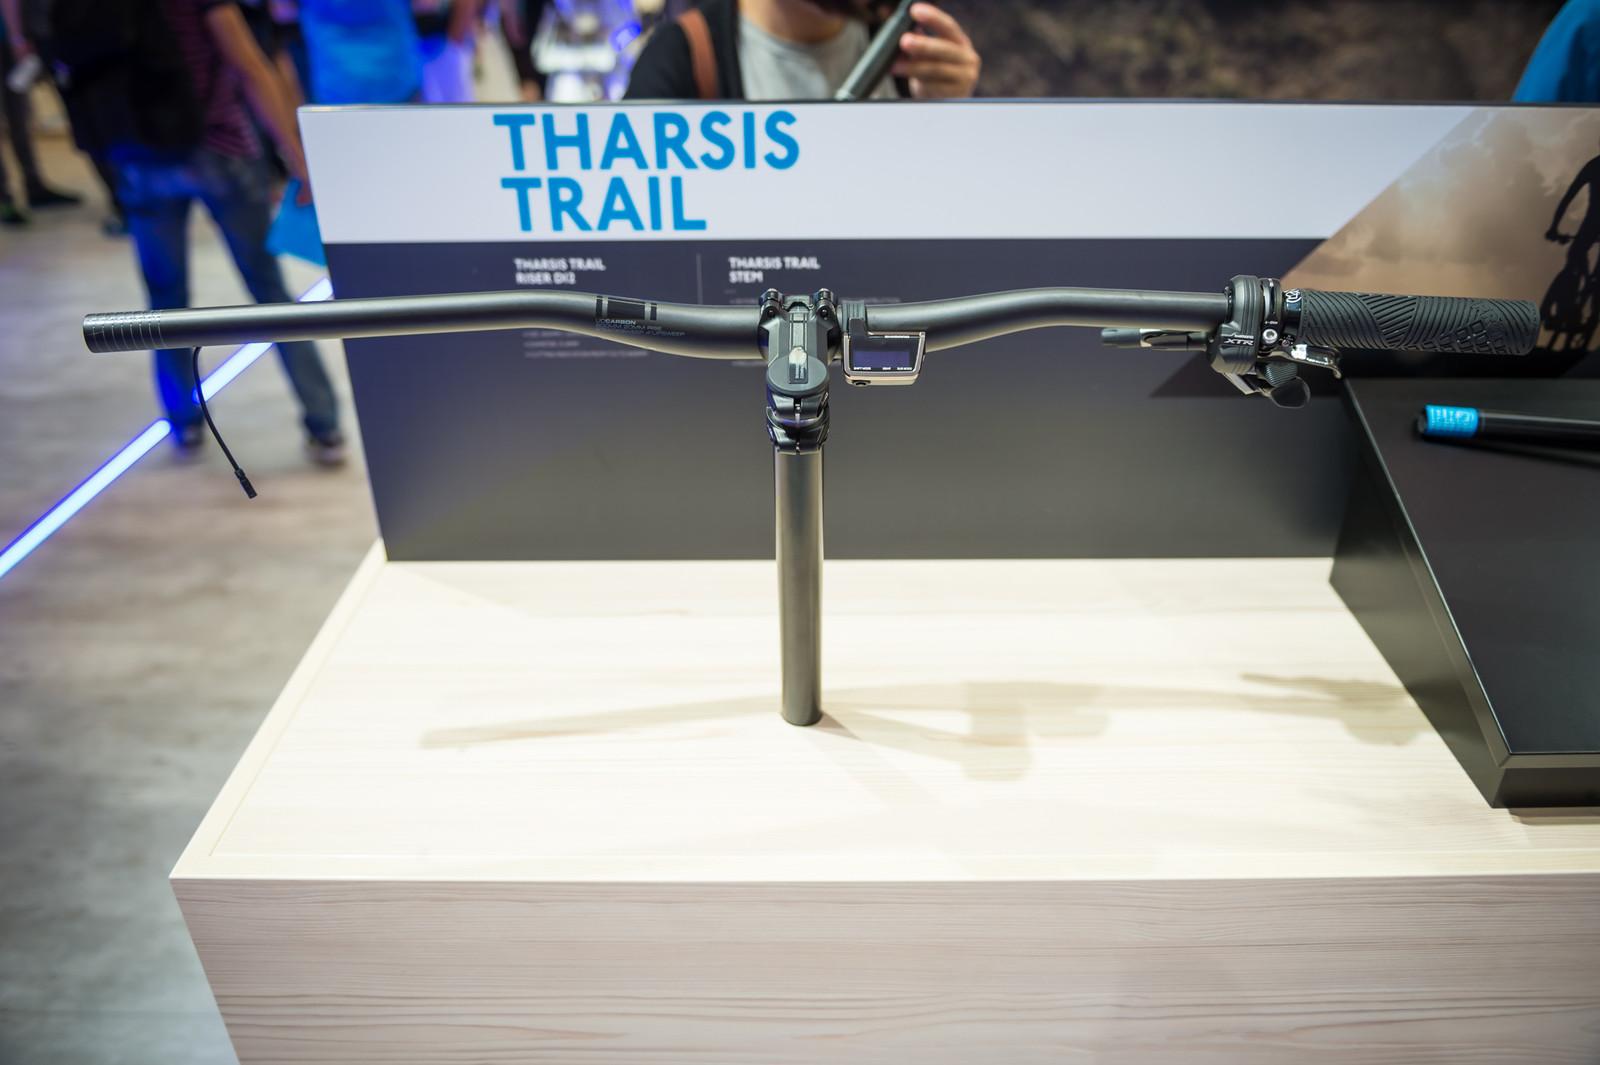 PRO / Shimano Tharsis and Koryak Di2 Cockpit - EUROBIKE - 2017 Mountain Bike Components - Mountain Biking Pictures - Vital MTB